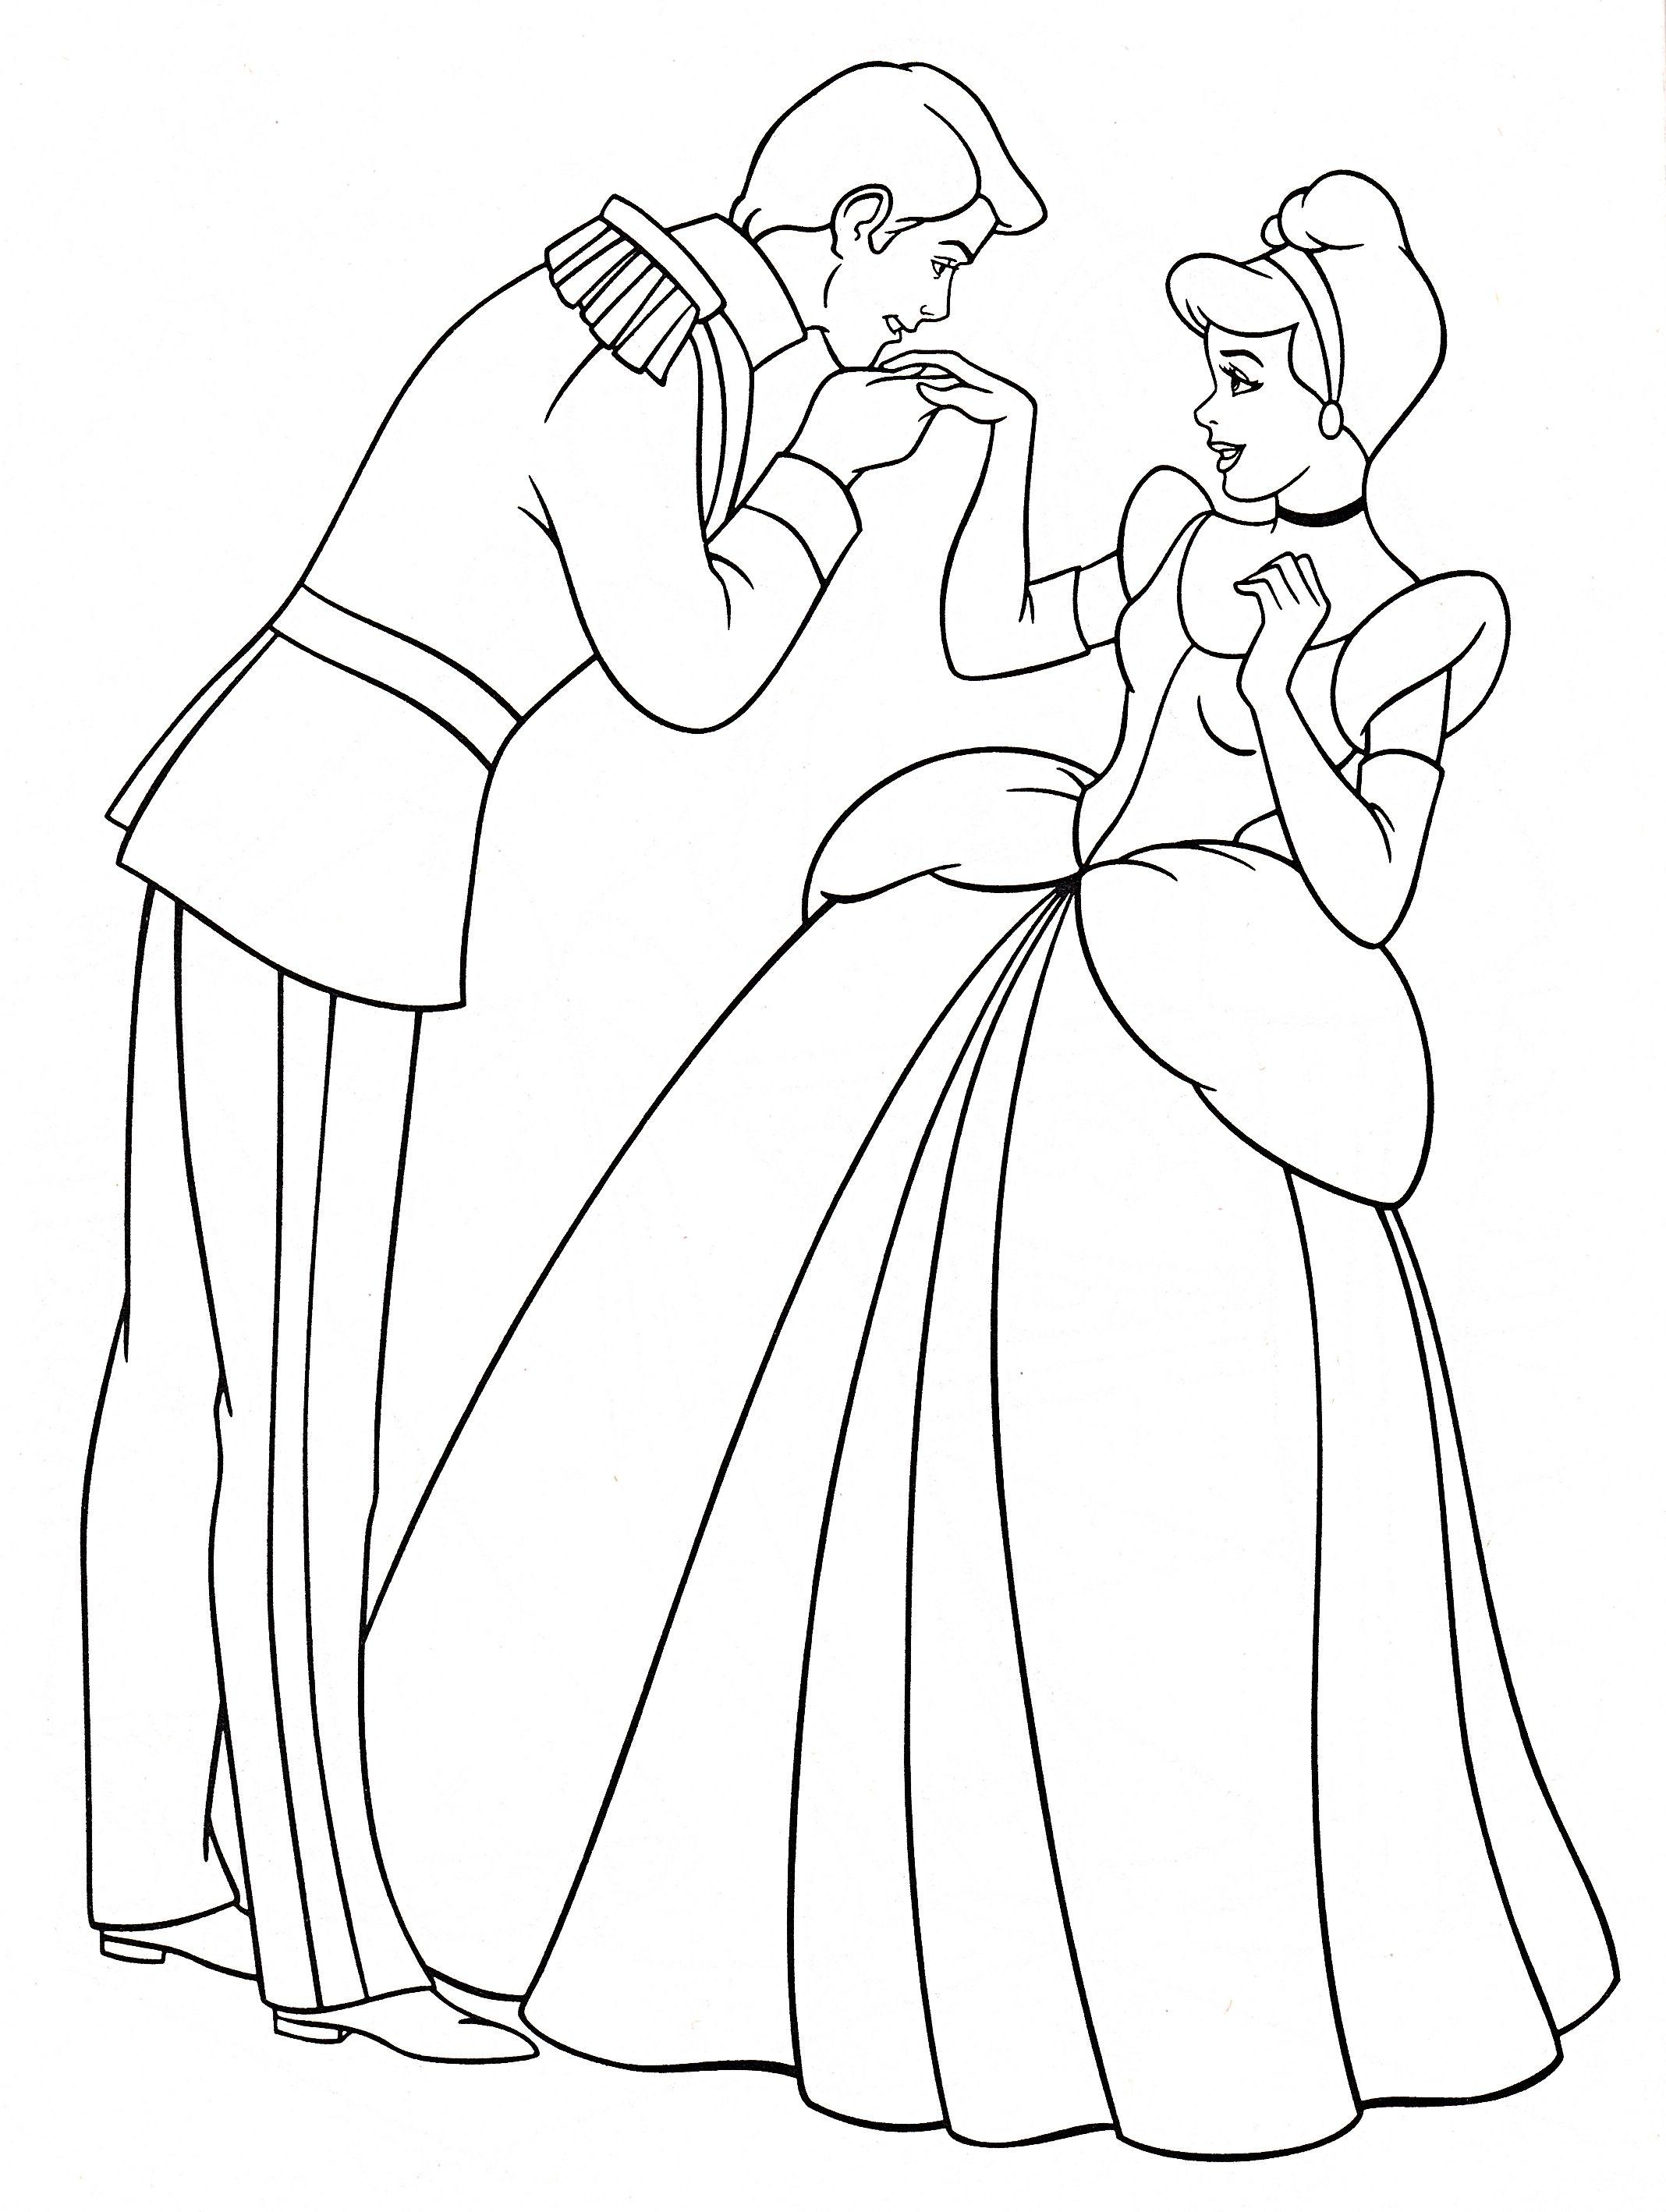 Walt disney coloring pages prince charming princess cinderella